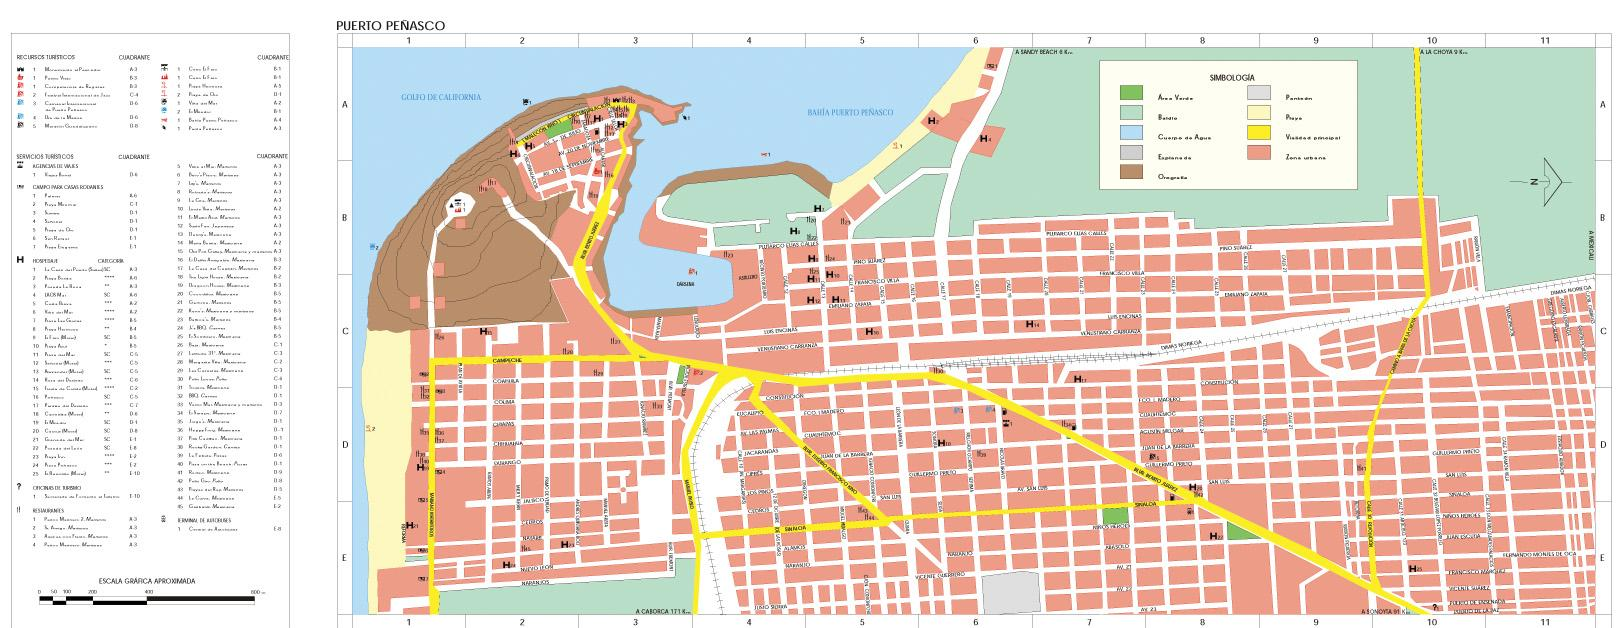 Mapa Puerto Peñasco, Sonora, Mexico